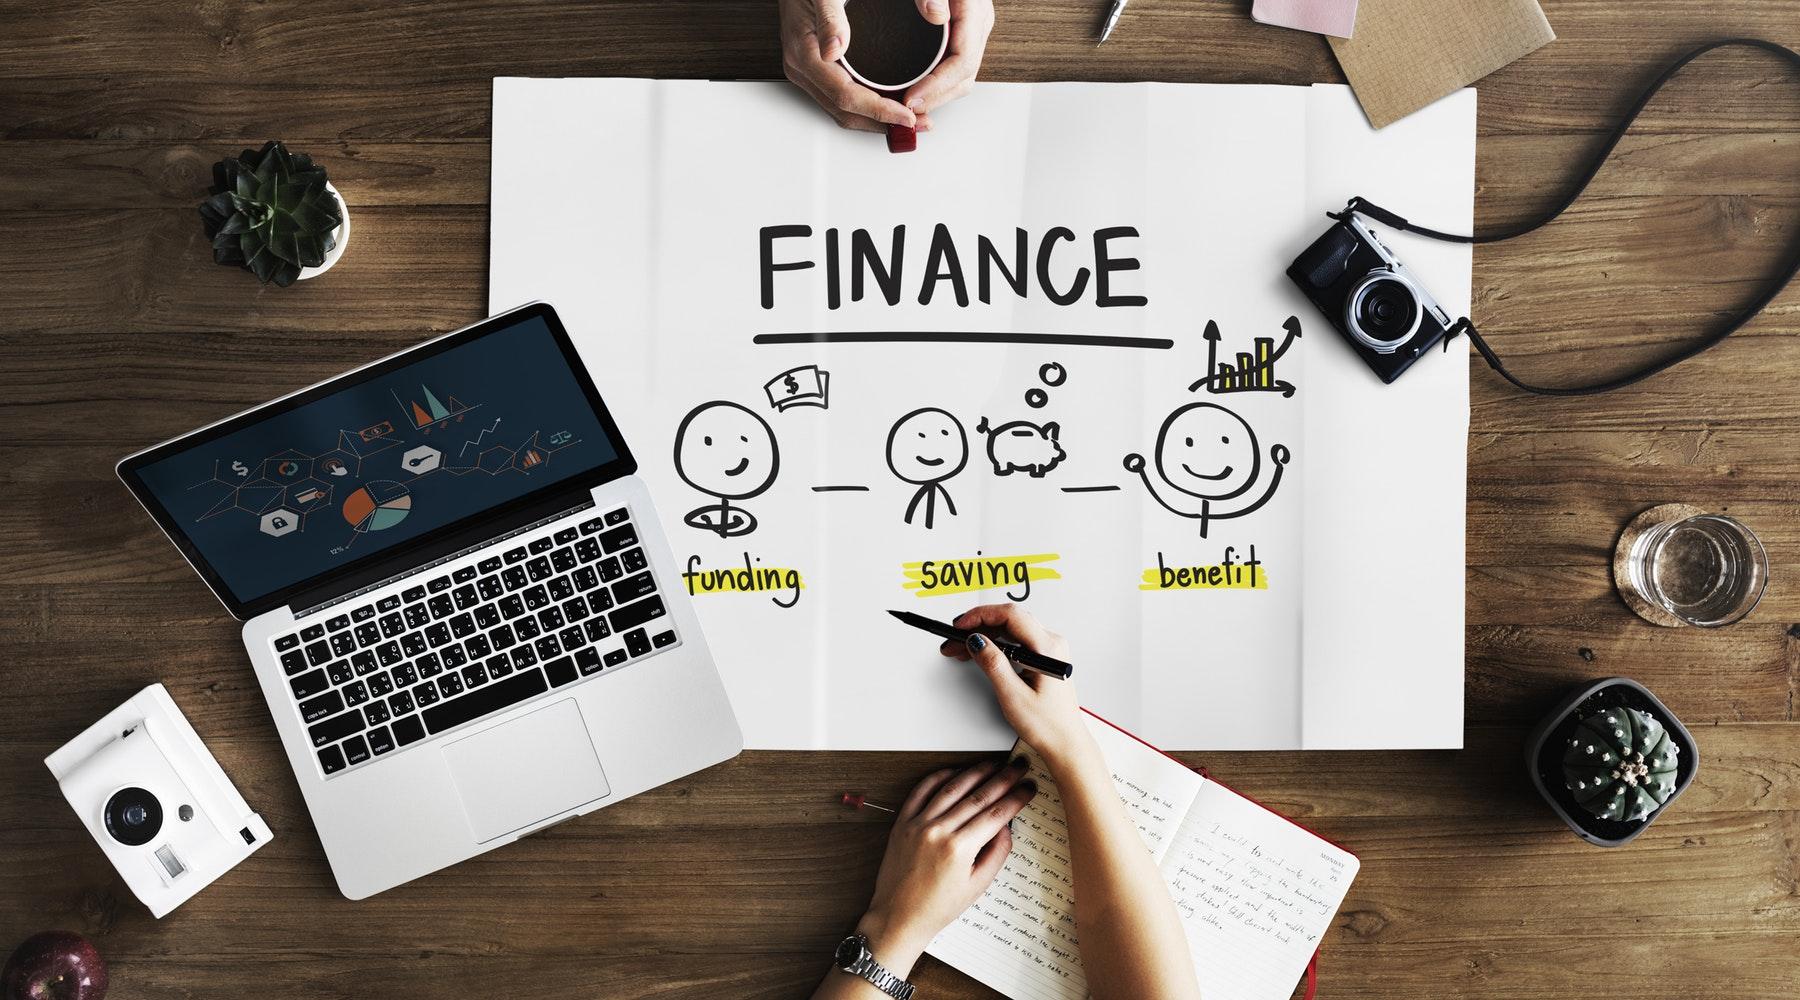 Personal Financial Management, Compliance, Risk Management [Free Course]